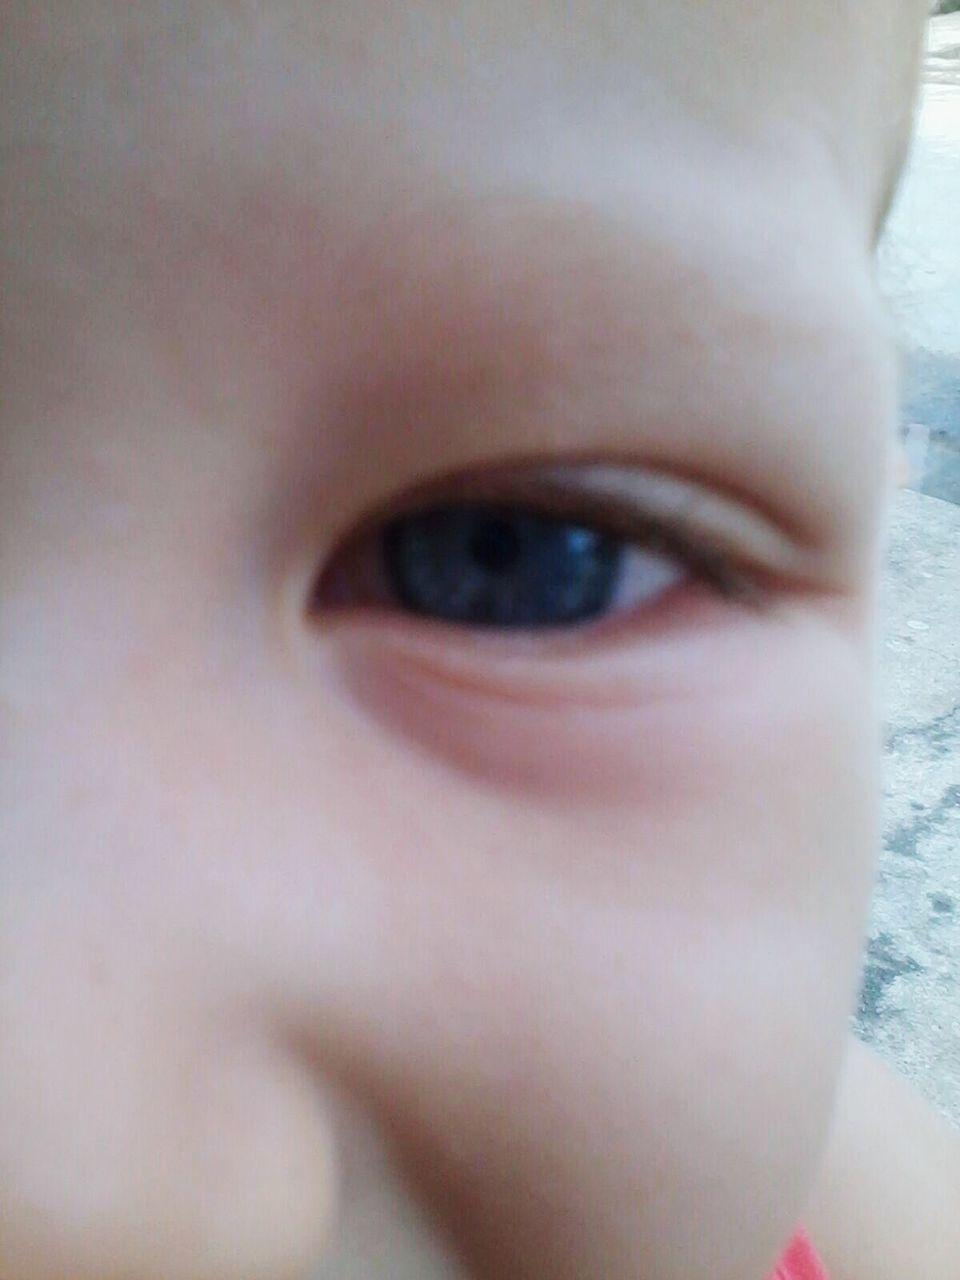 human eye, human body part, one person, close-up, childhood, human face, human skin, real people, looking at camera, portrait, indoors, sensory perception, day, human hand, eyelash, eyeball, people